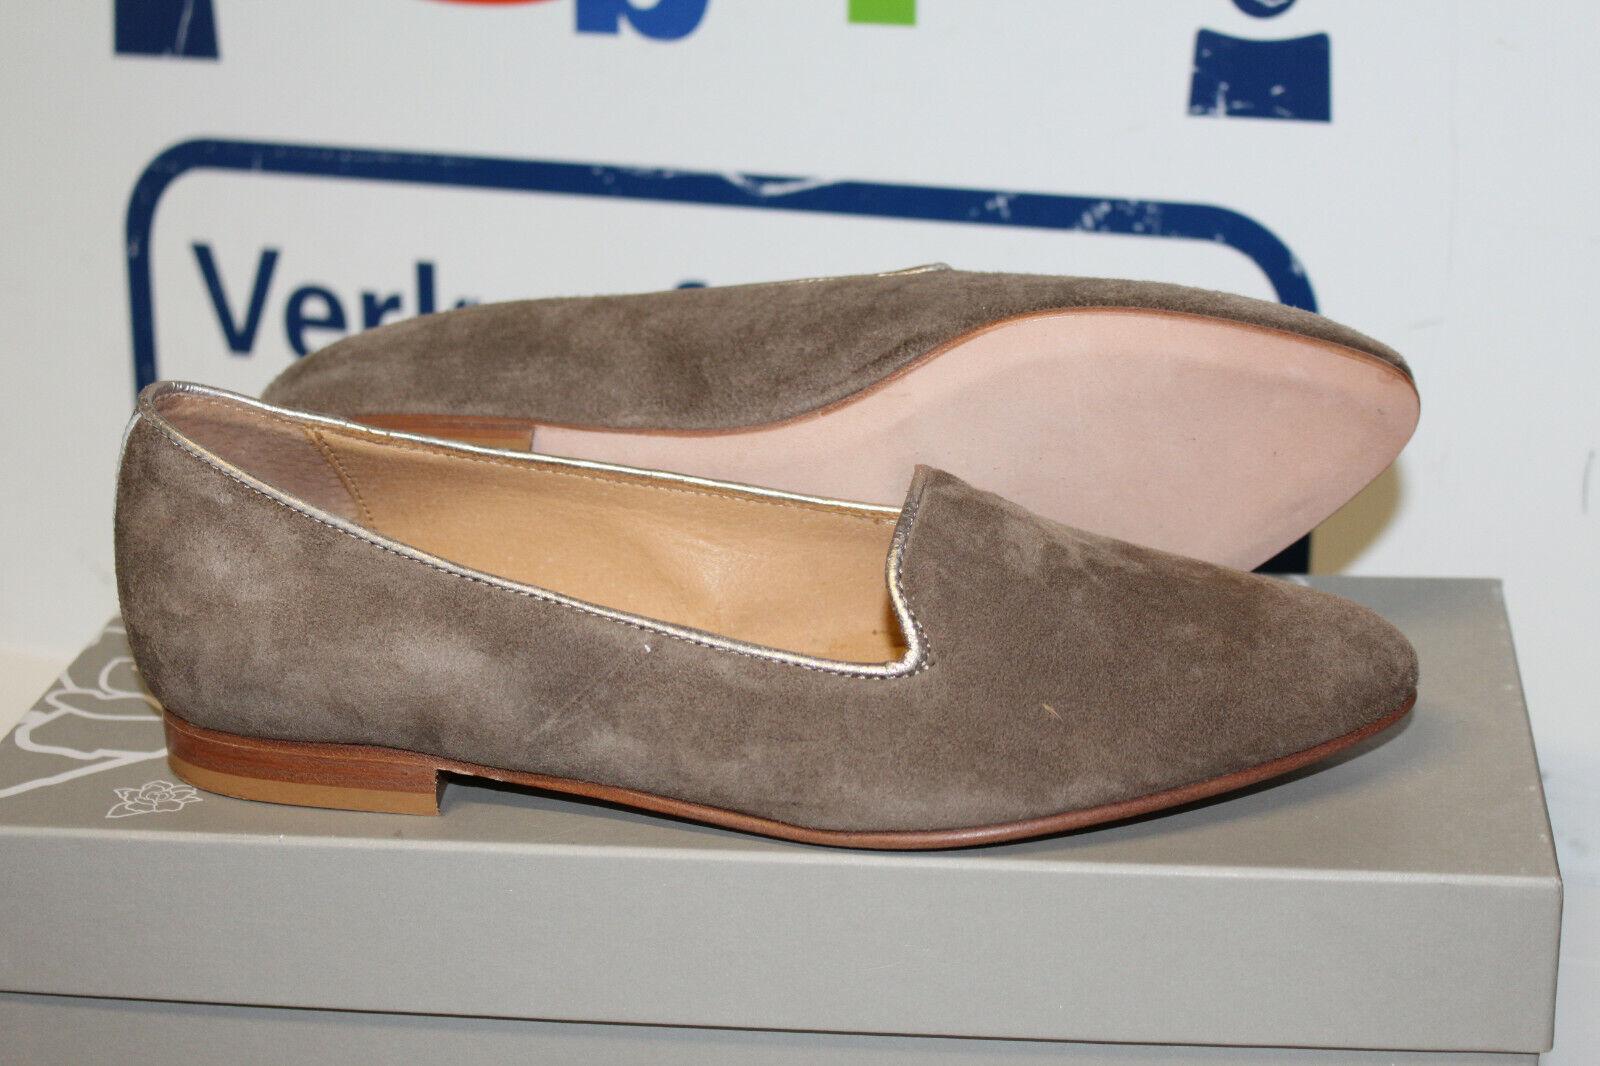 Maluo Damen Slipper-Schuhe Julia Leder  Gr 38 Neu